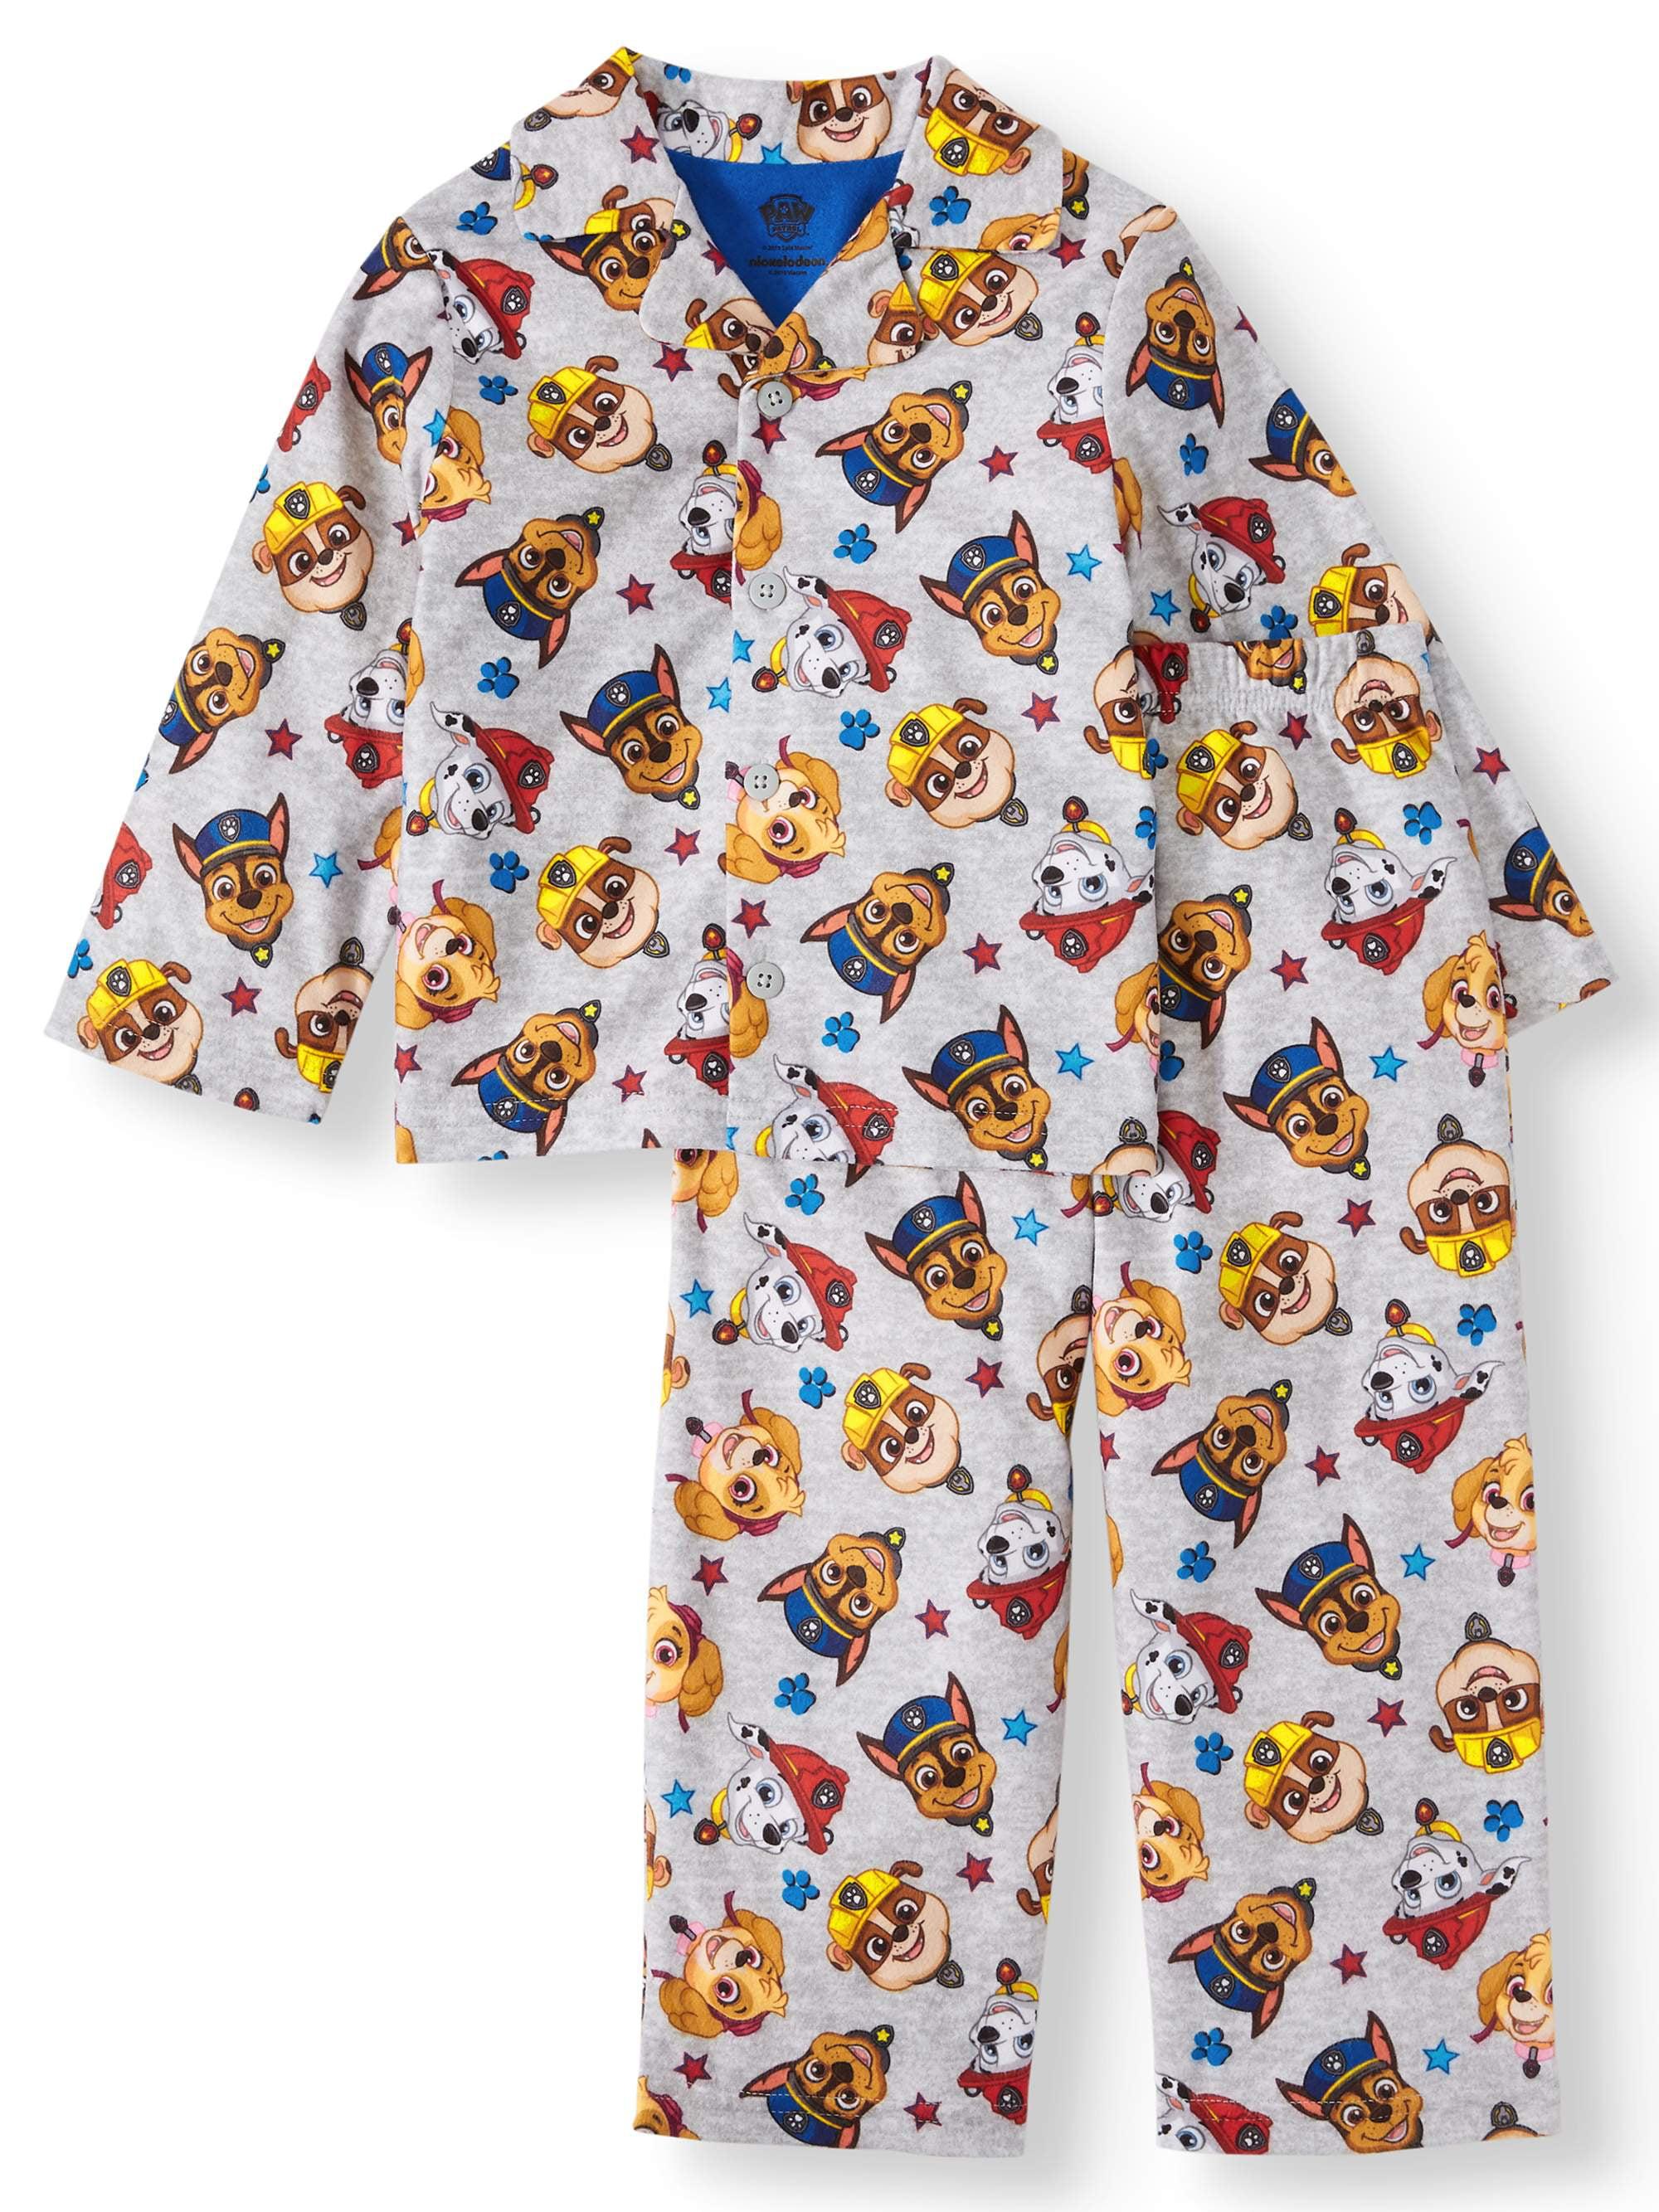 Paw Patrol Character Pyjamas Baby Boys Kids PJs Nightwear 6 9 12 18 24 Months